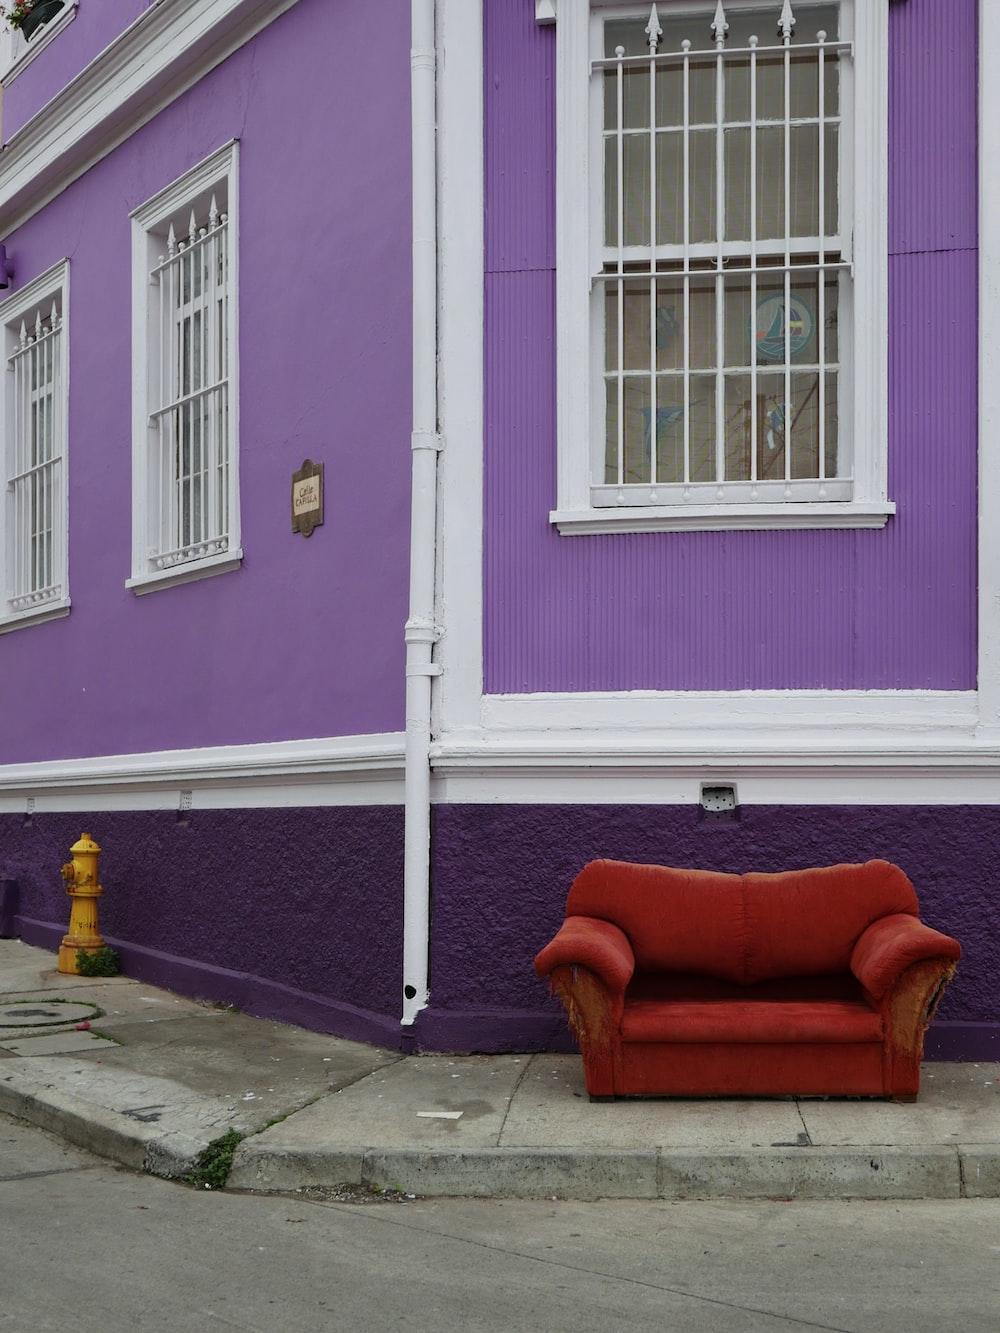 red sofa chair near purple painted wall